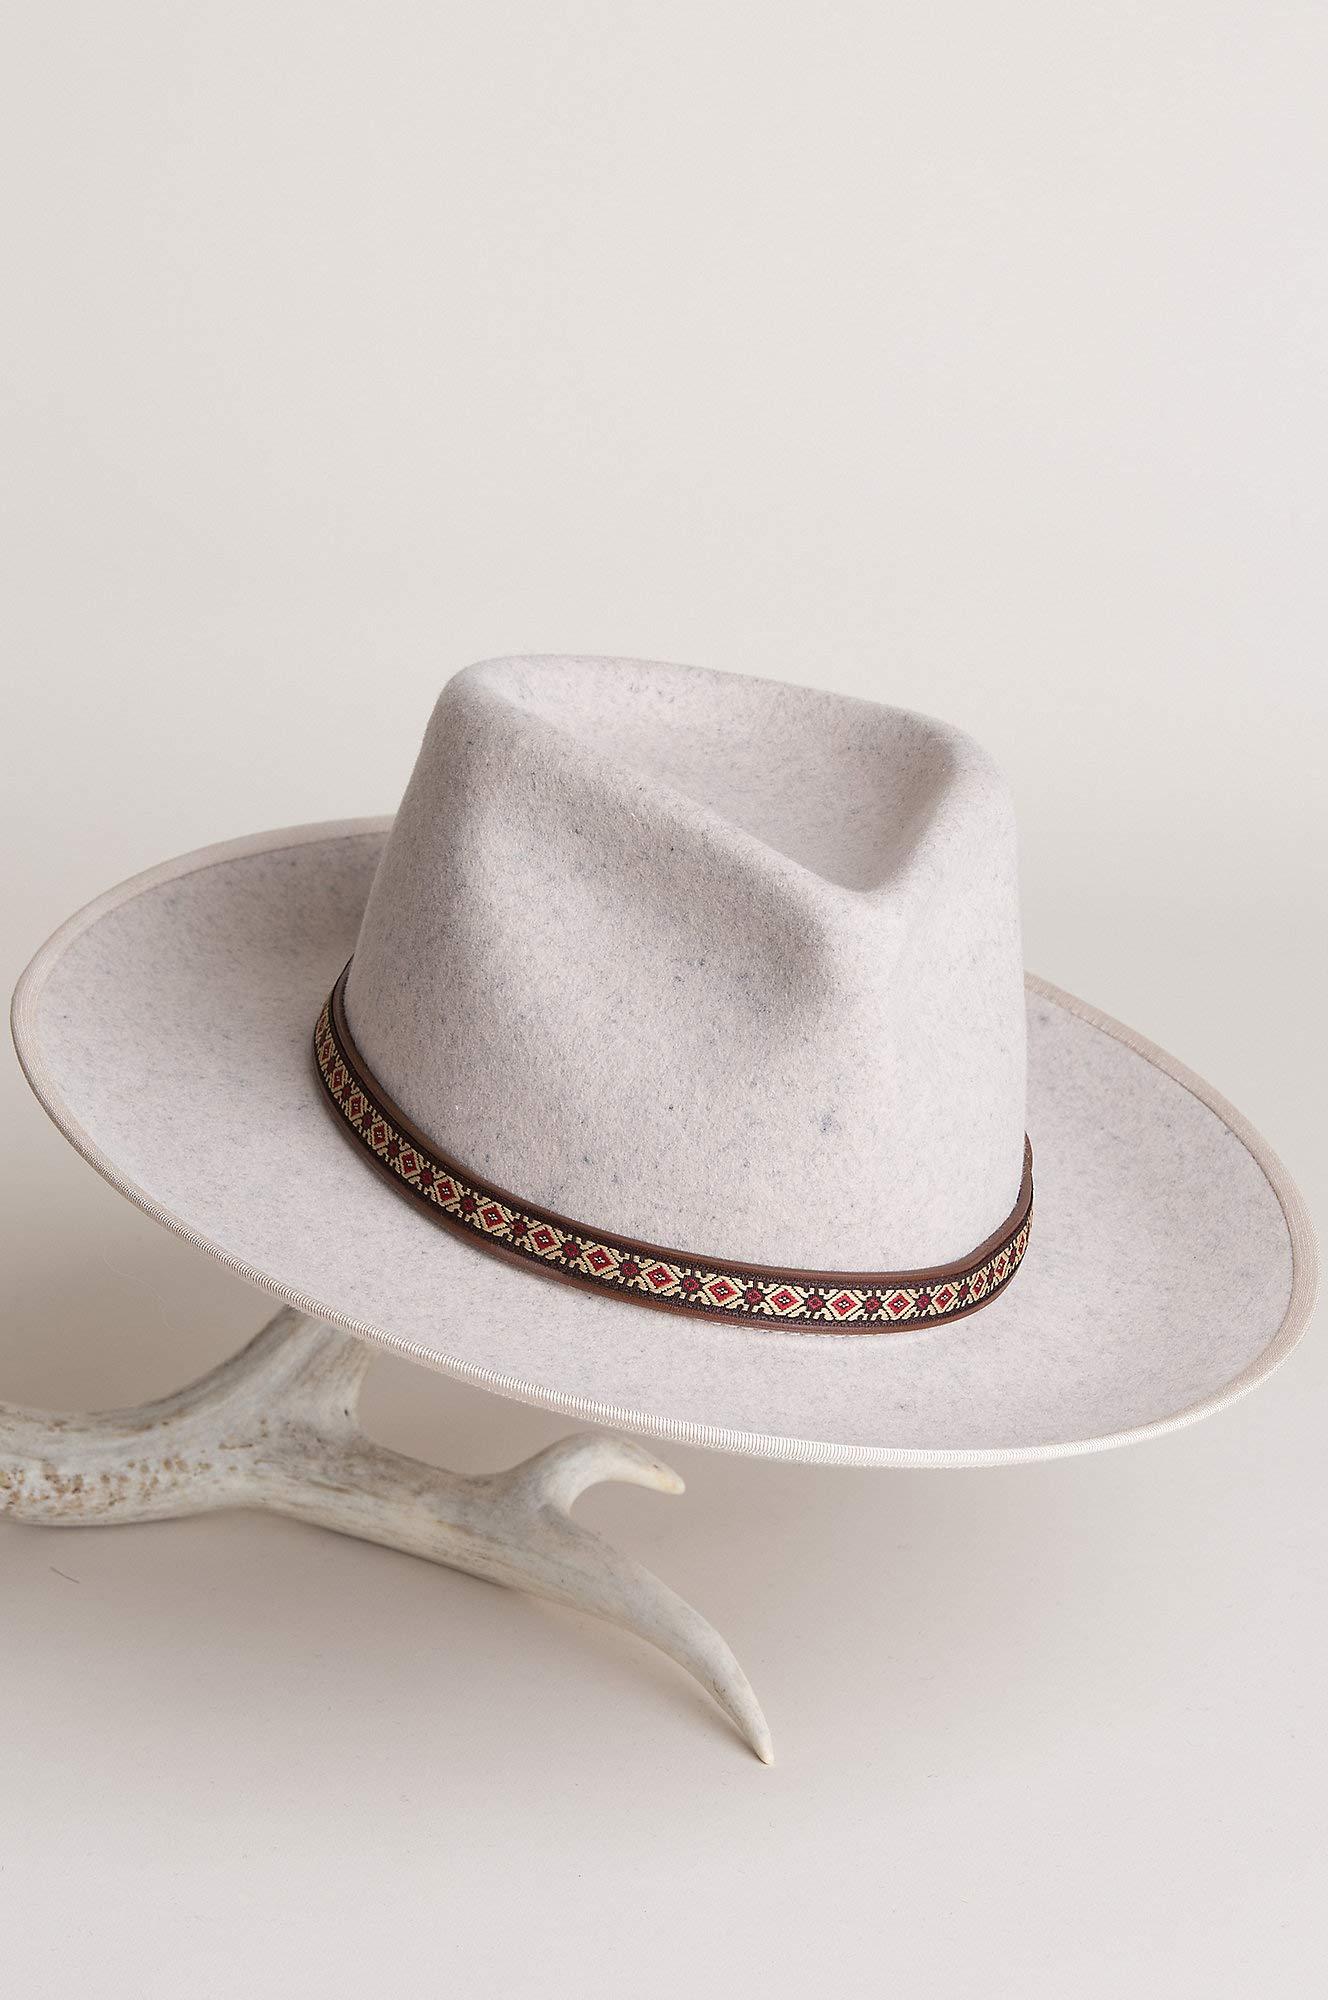 Overland Sheepskin Co Alpes Wide Brim Wool Felt Fedora Hat by Overland Sheepskin Co (Image #7)